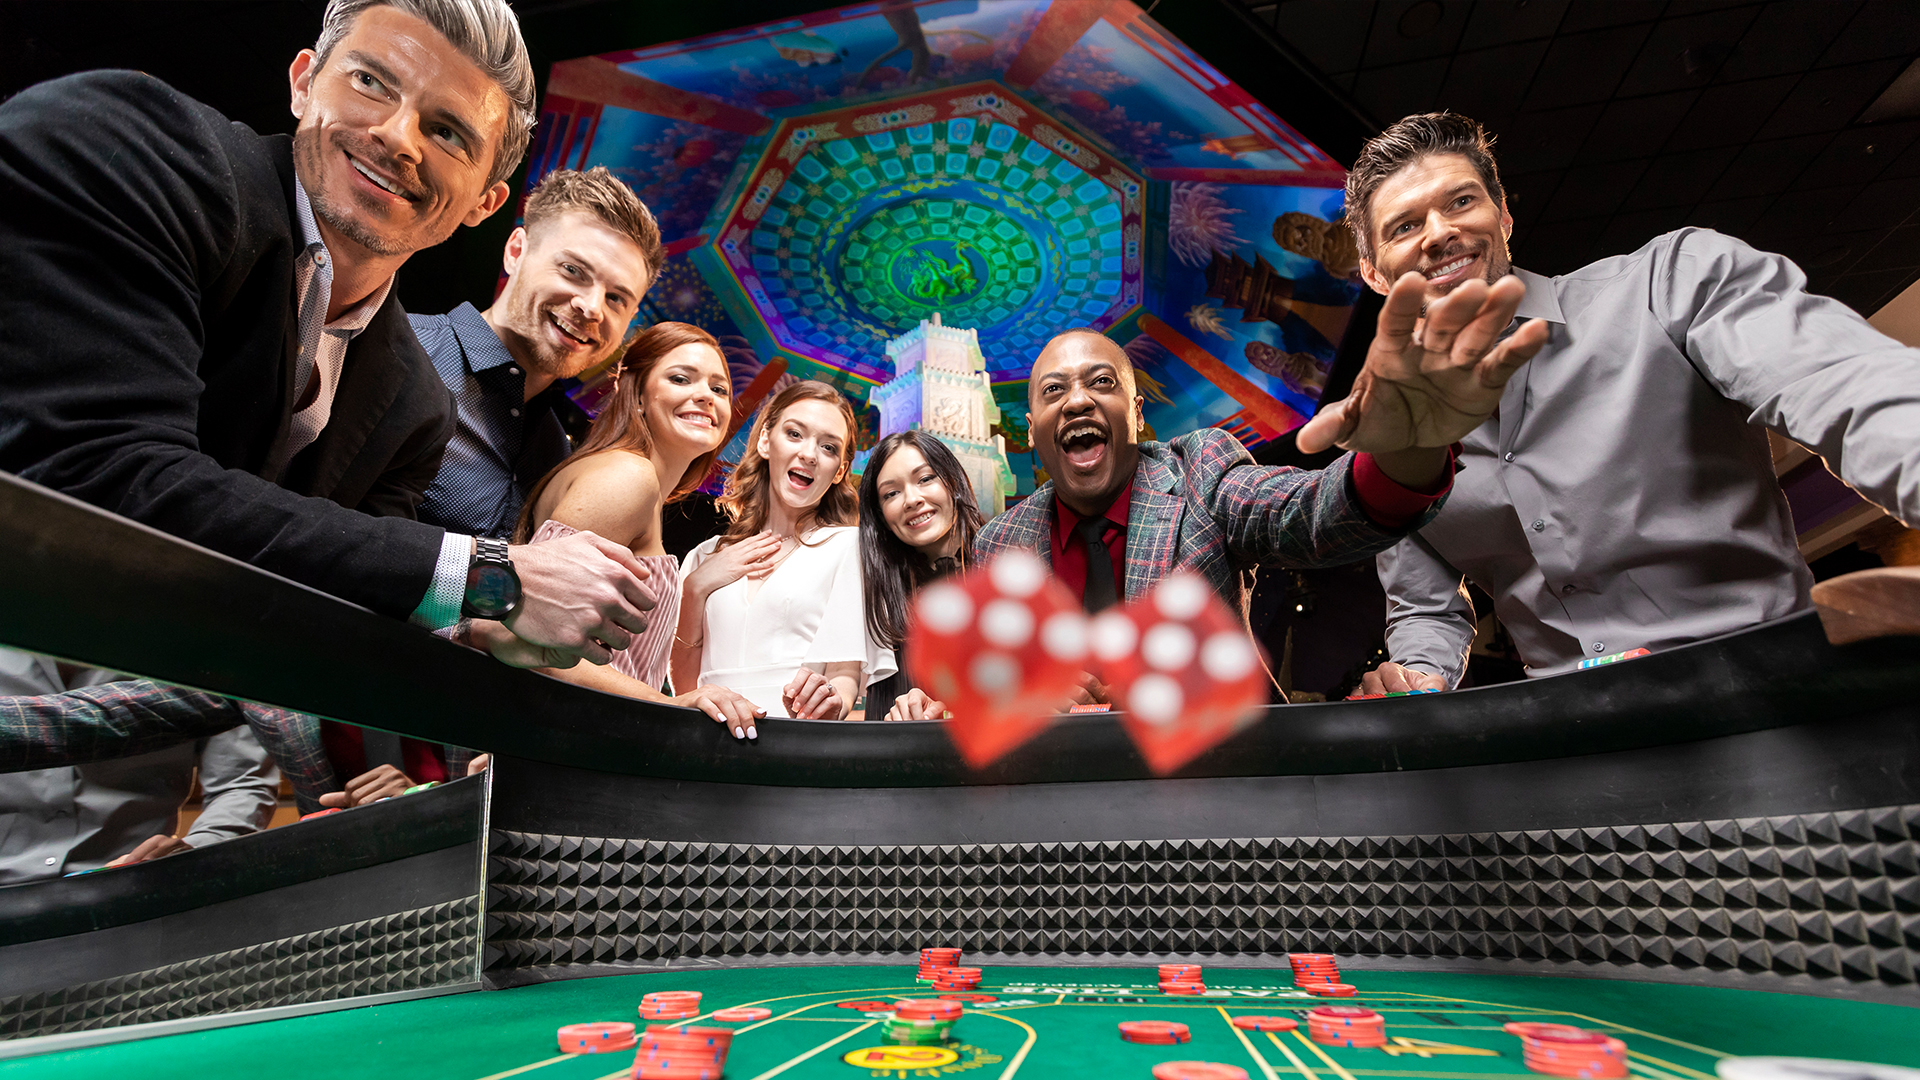 Powerful PBN Pyramids Poker/Casino/Gambling Site SEO Backlinks Package 2021 V2